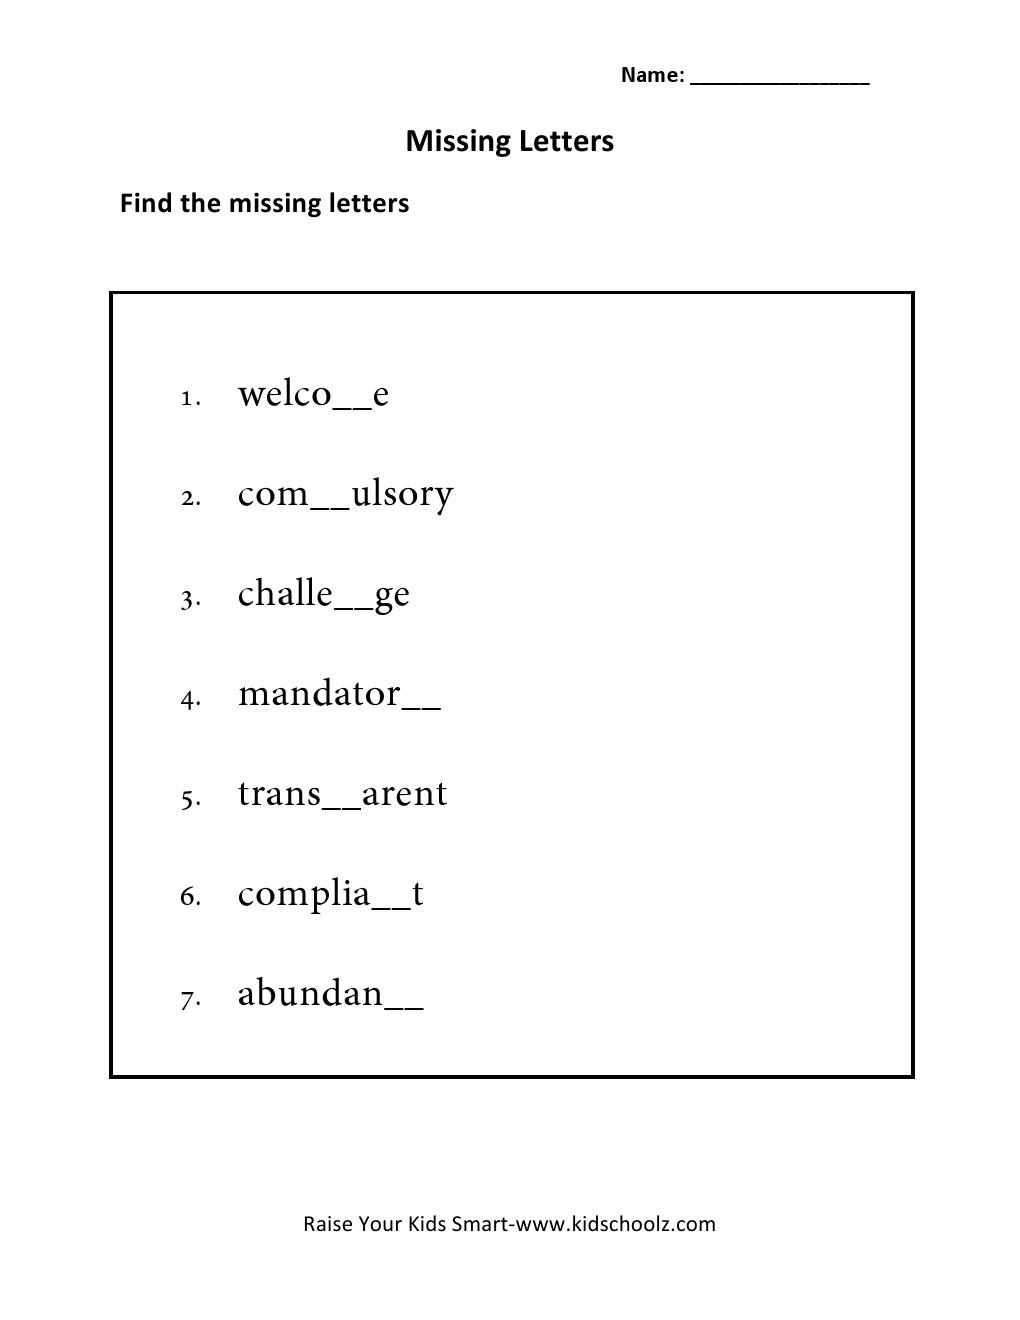 Grade 5 - Missing Letter Worksheet 5 - Kidschoolz regarding Letter 5 Worksheets